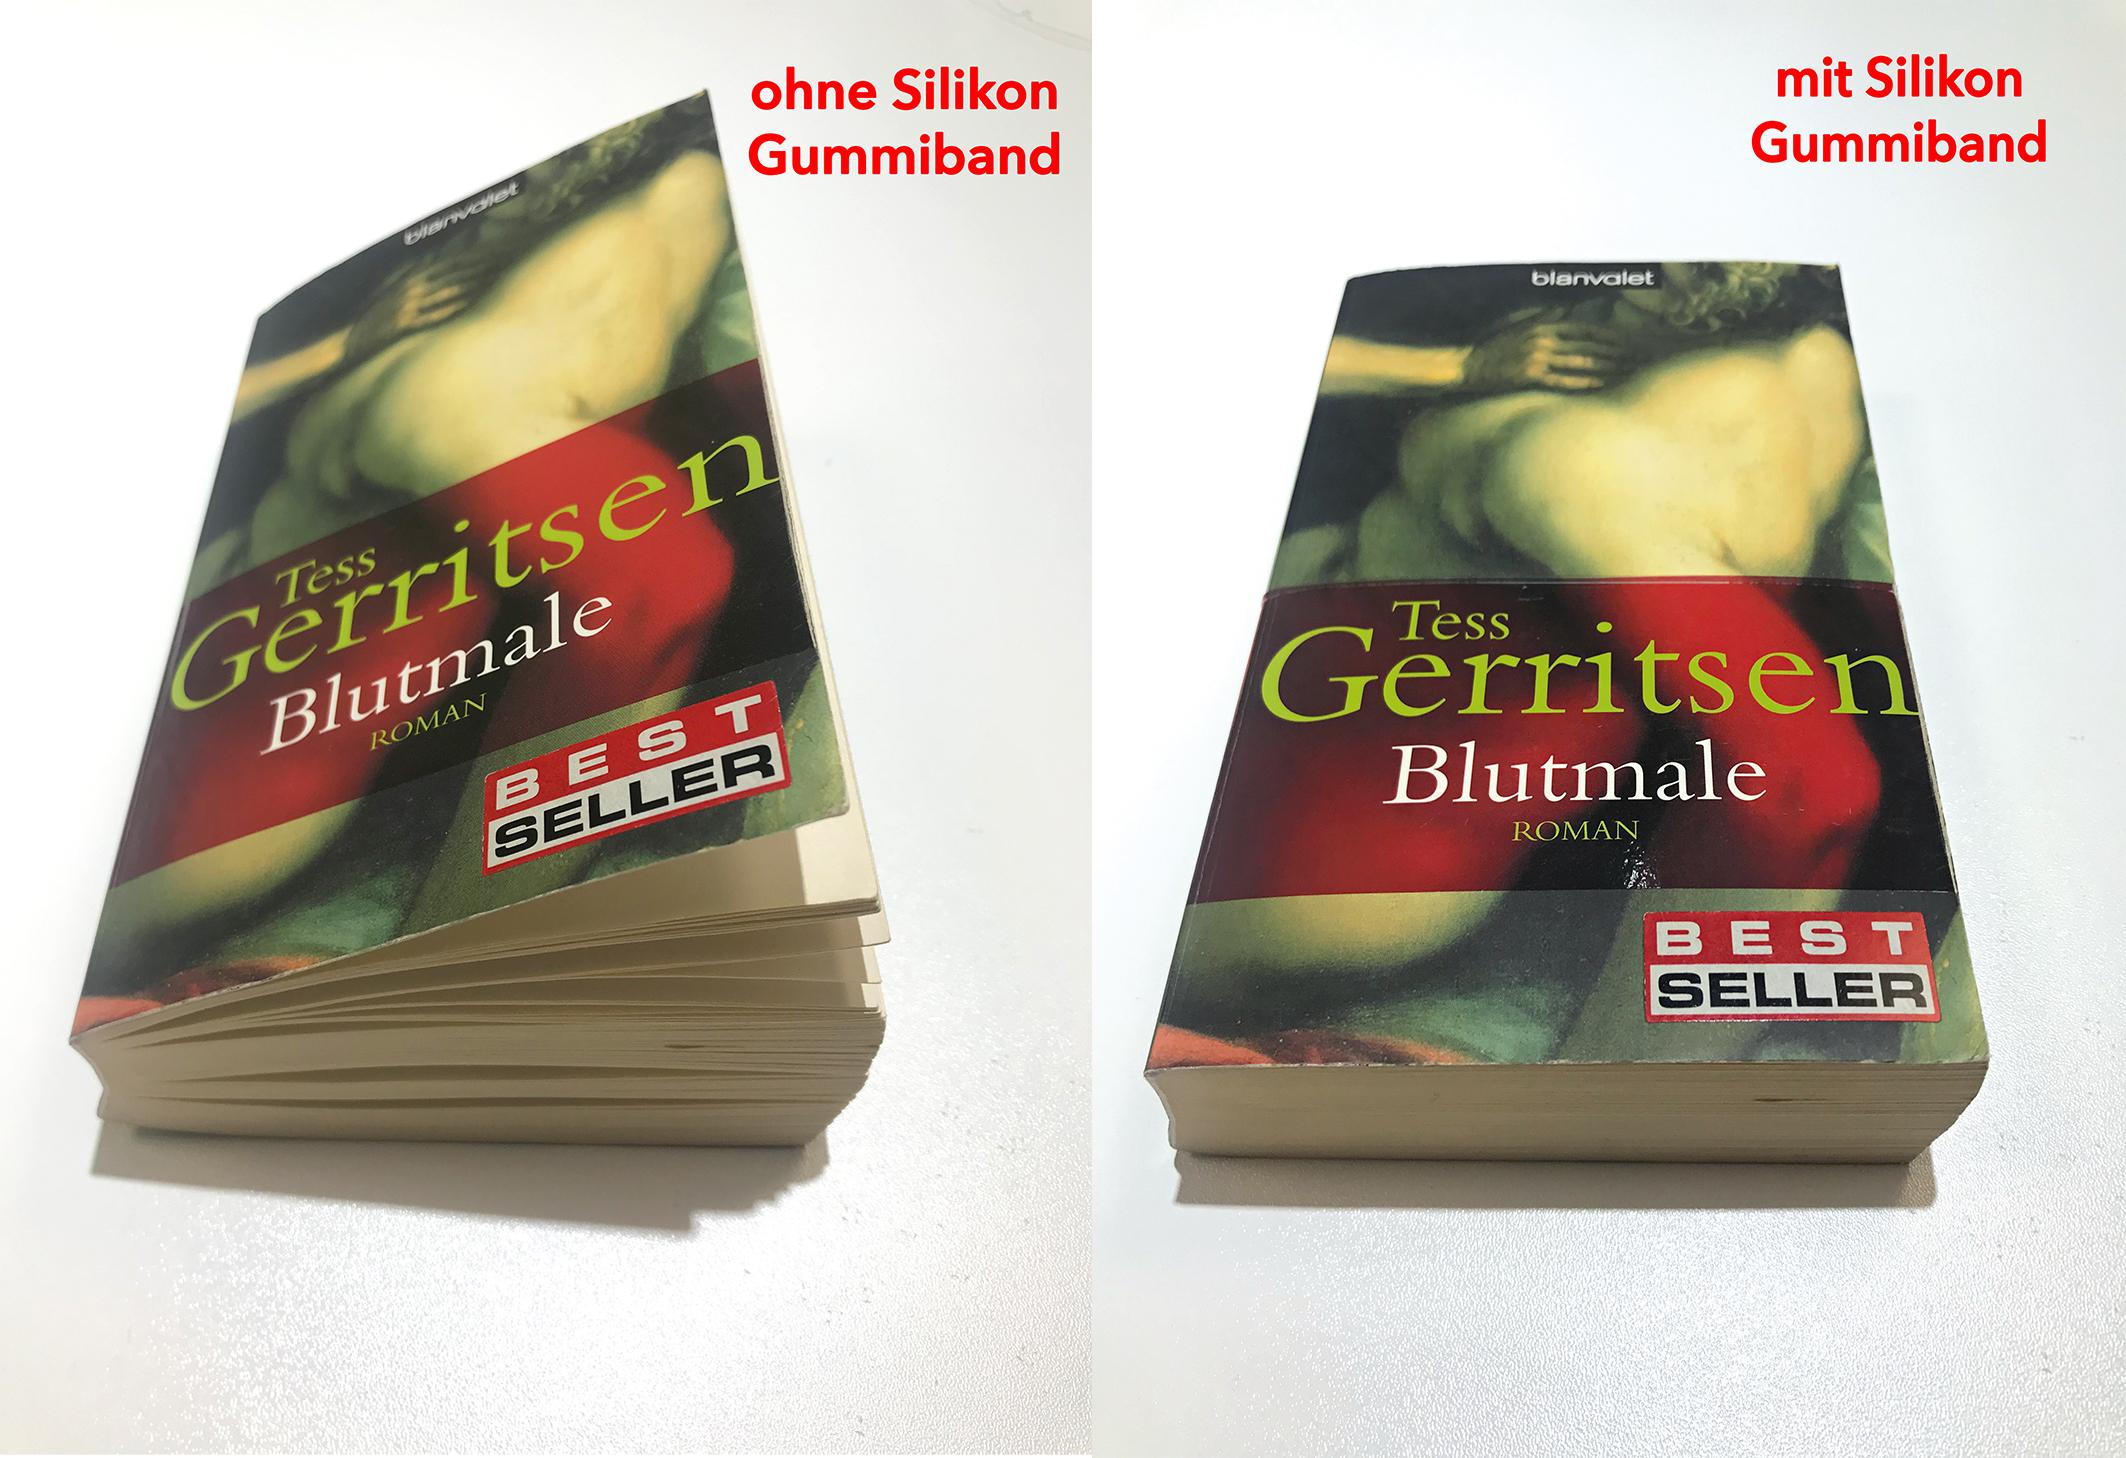 Silikon Gummibänder Bücher (Bestseller)